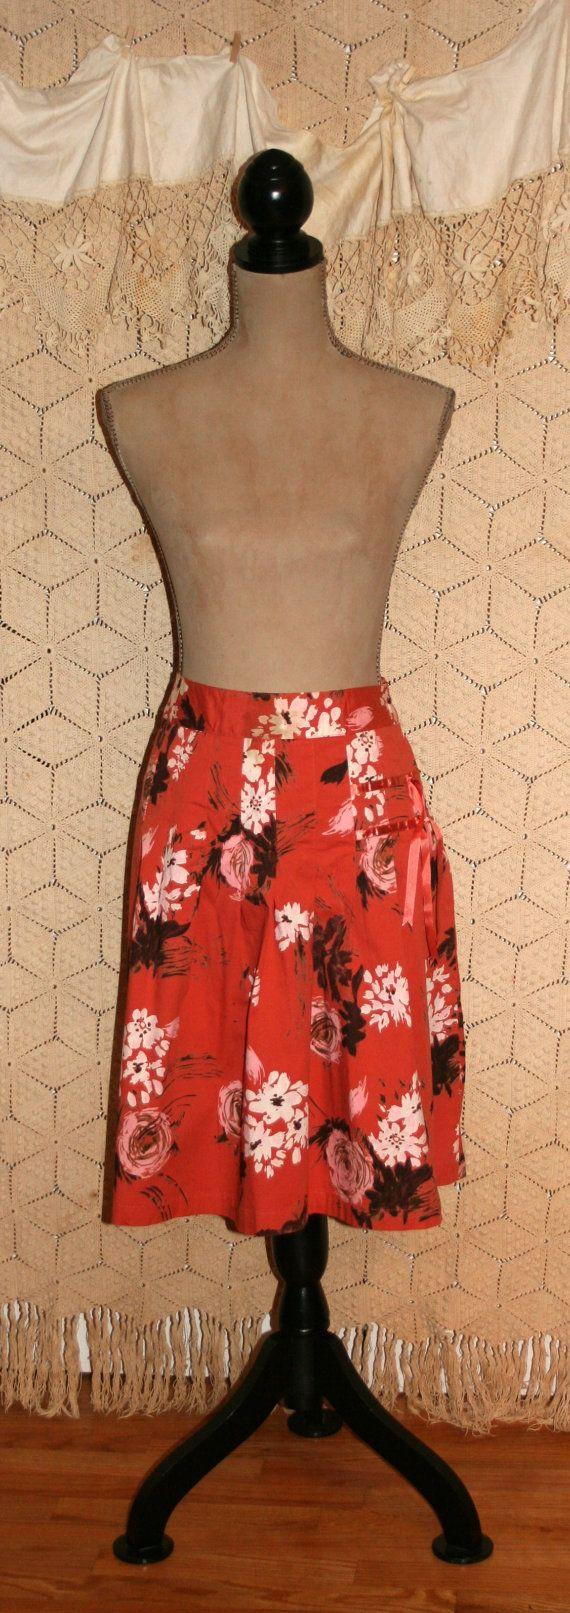 Floral Skirt Orange Print Skirt Fall Skirt Autumn by MagpieandOtis